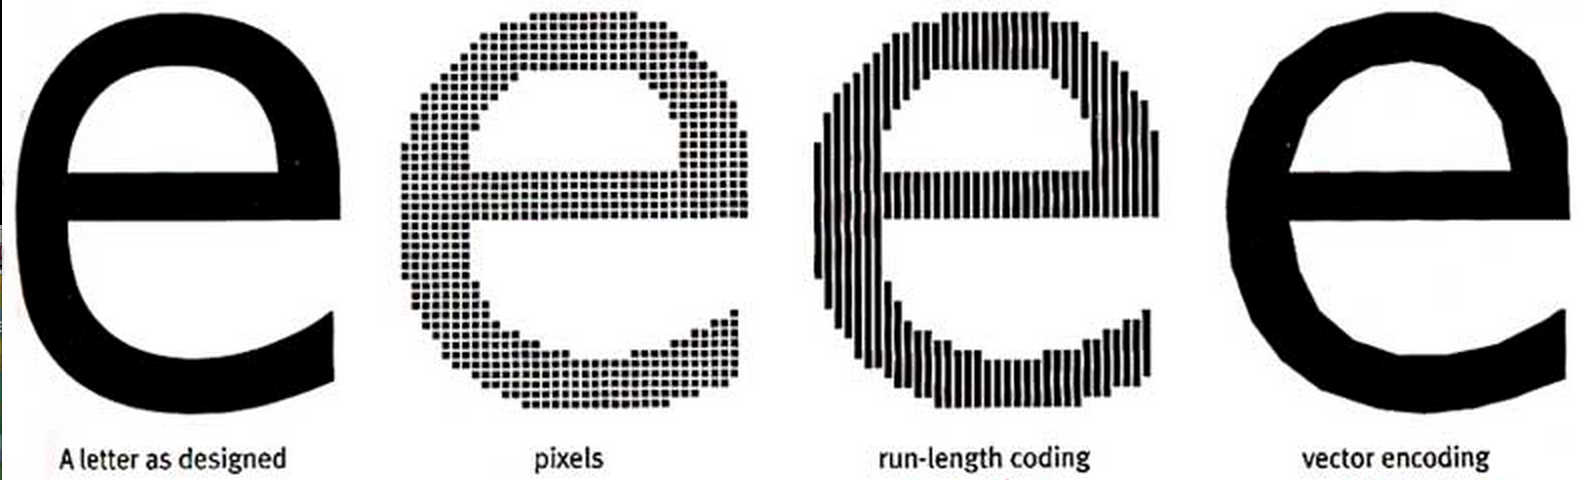 Primeras Tipografias